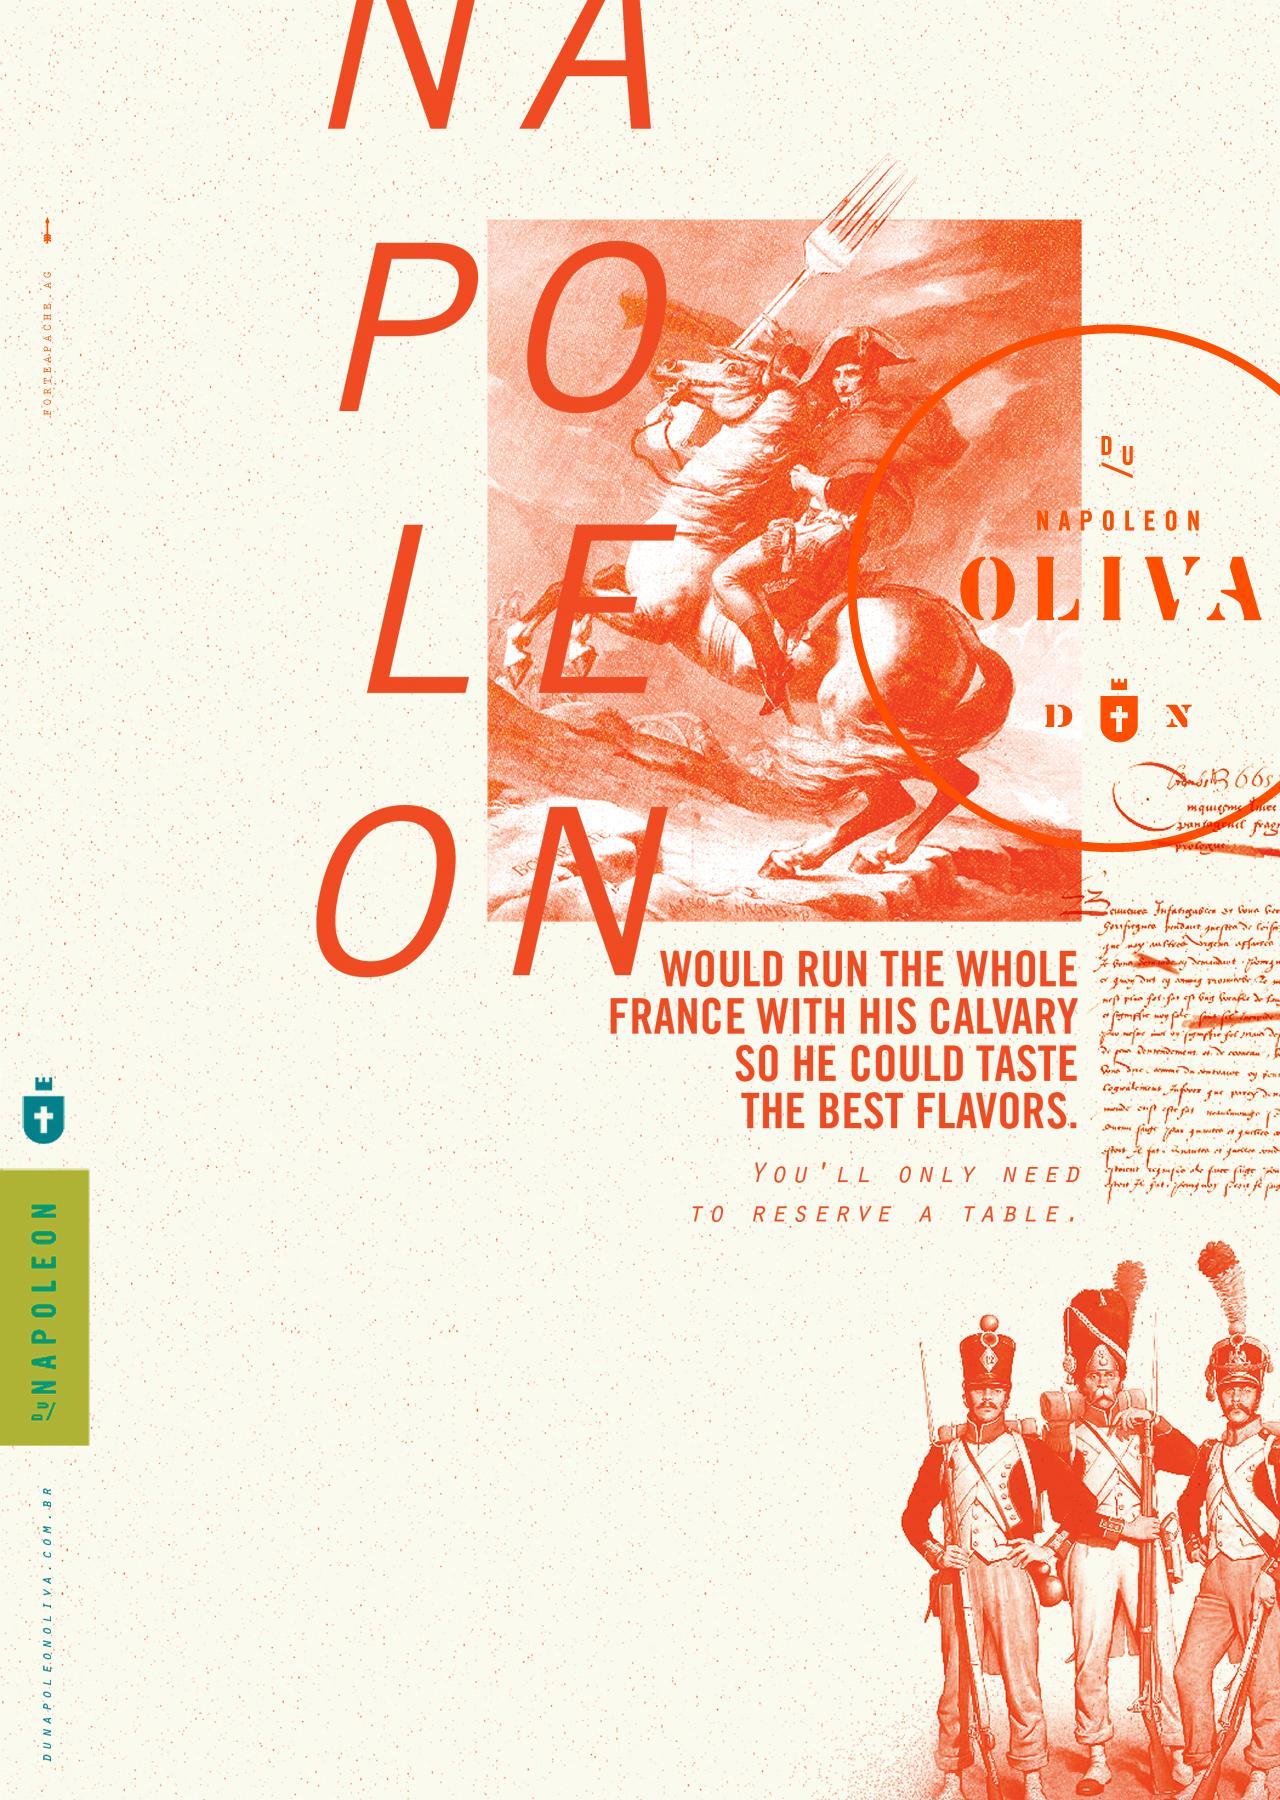 Du Napoleon Oliva Print Ad - Table